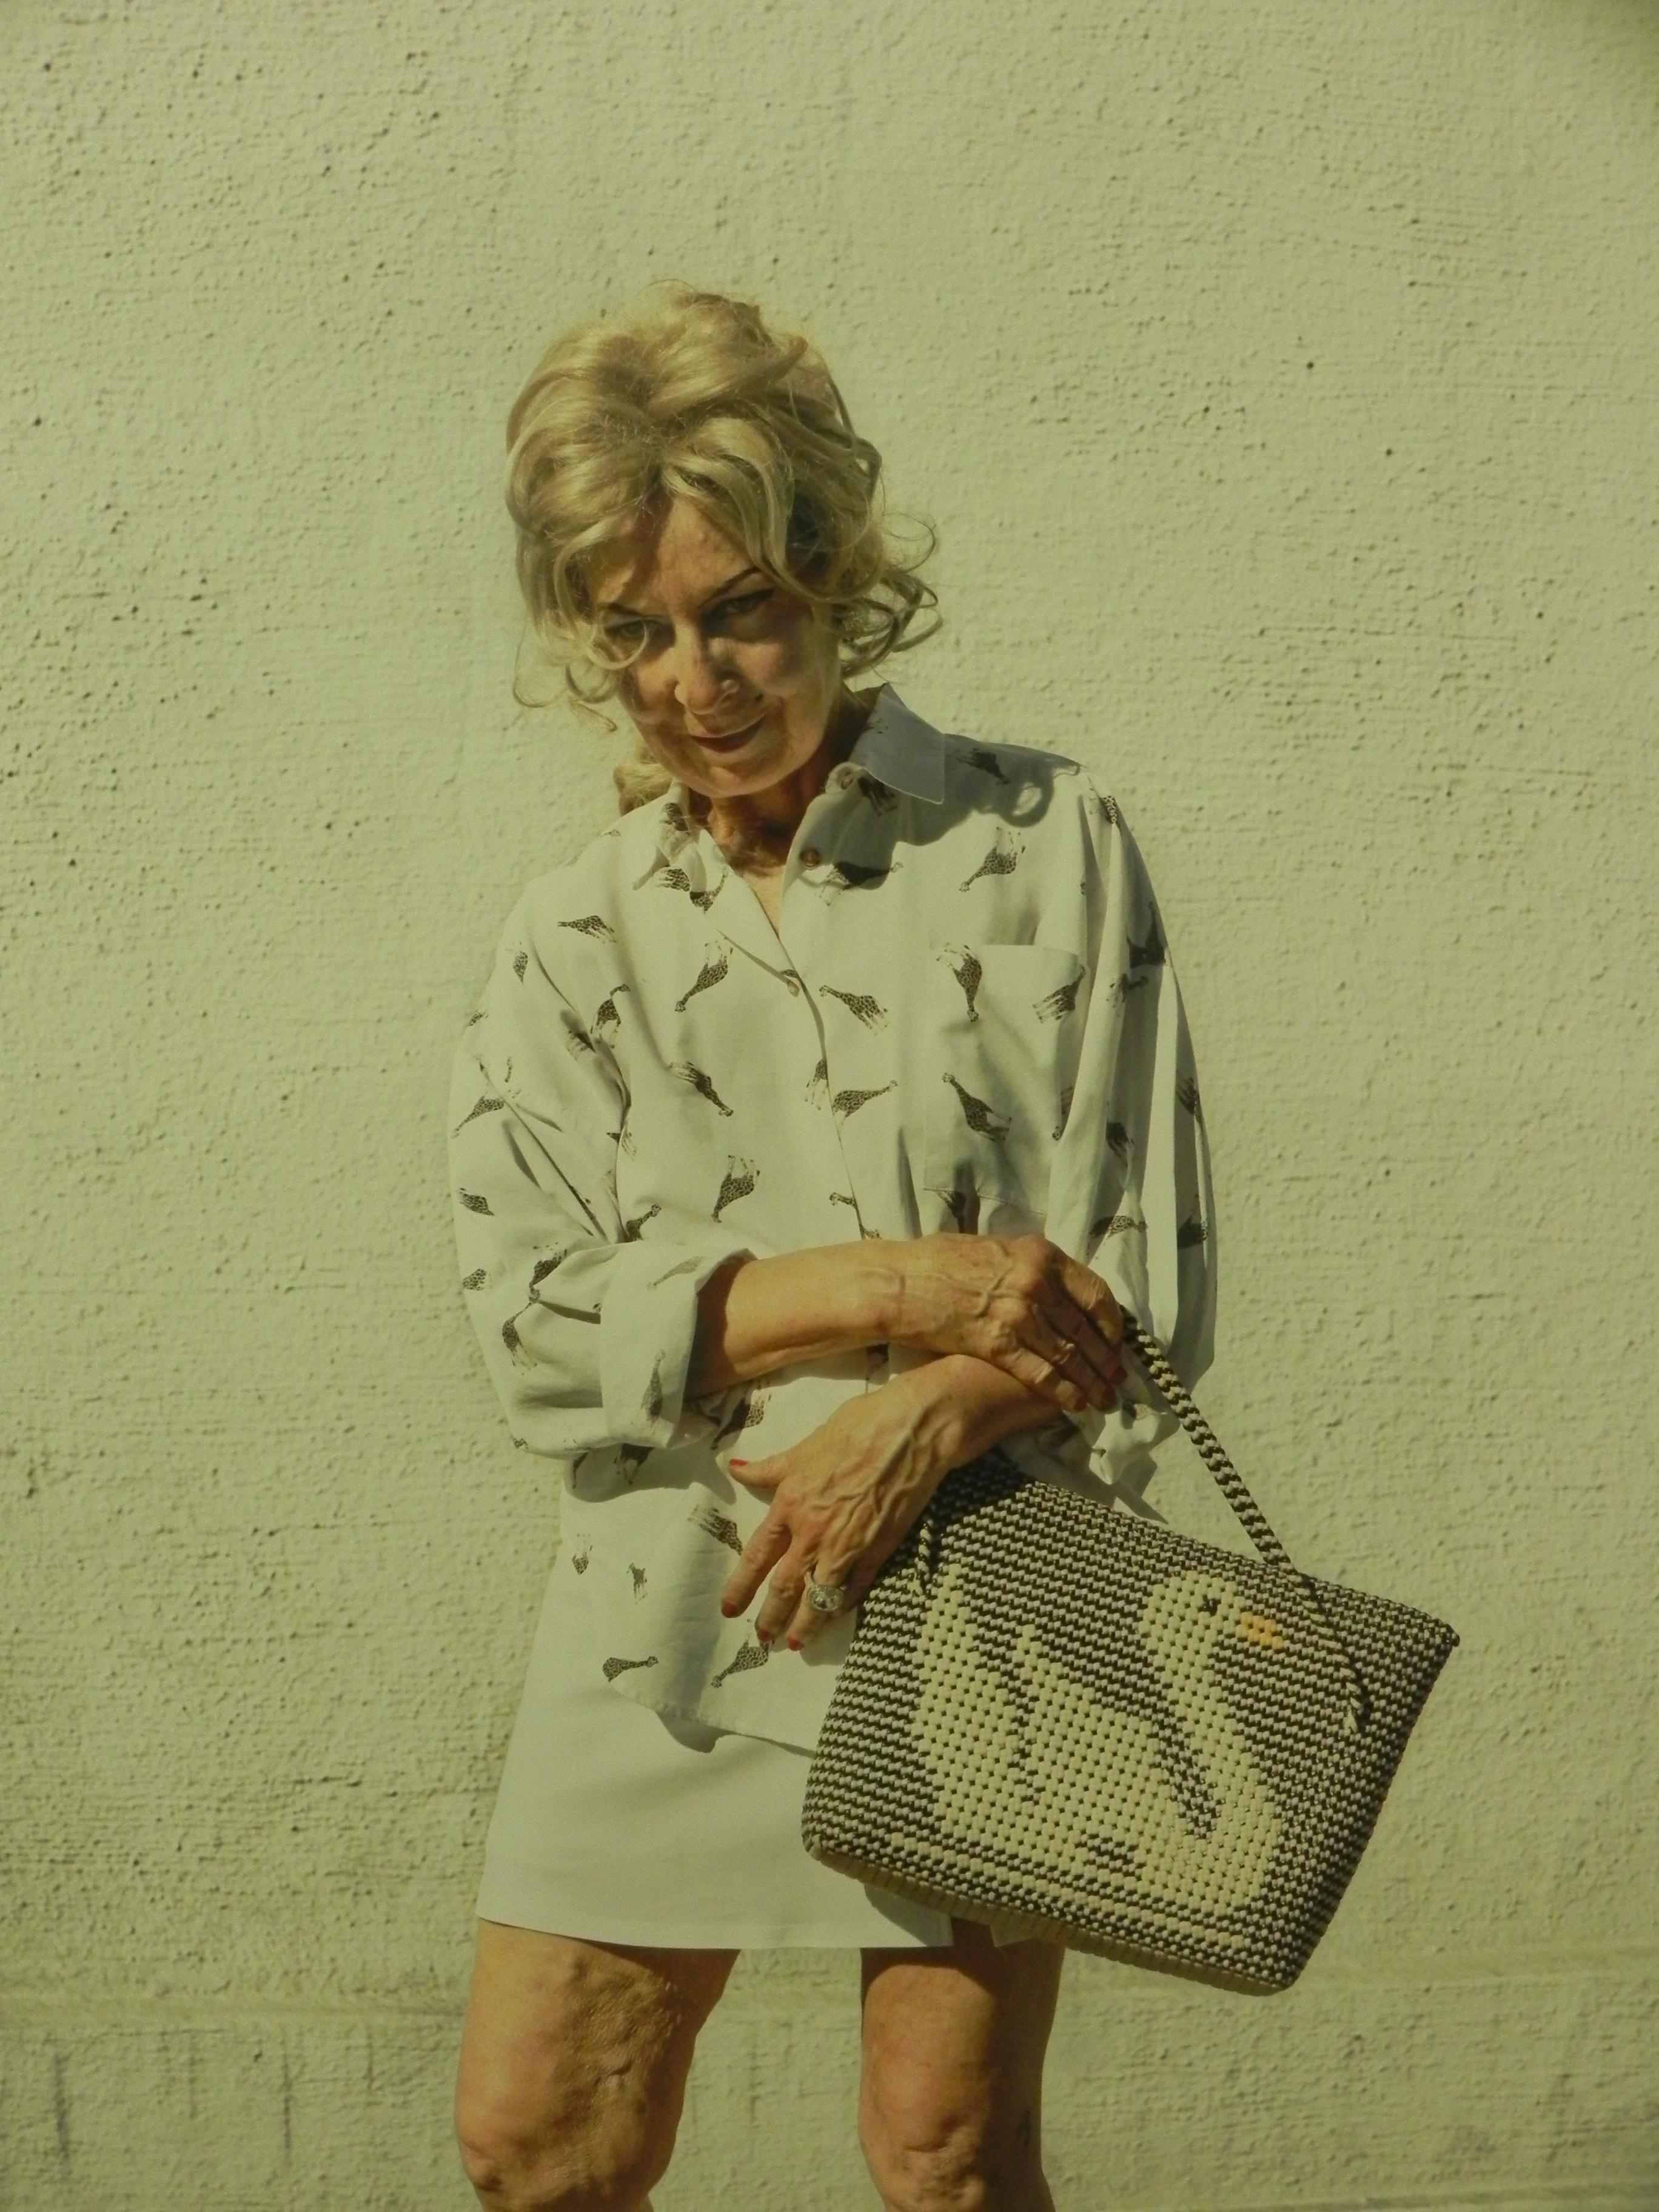 Katy Grannan. Boulevard Series. Saatchi Gallery.